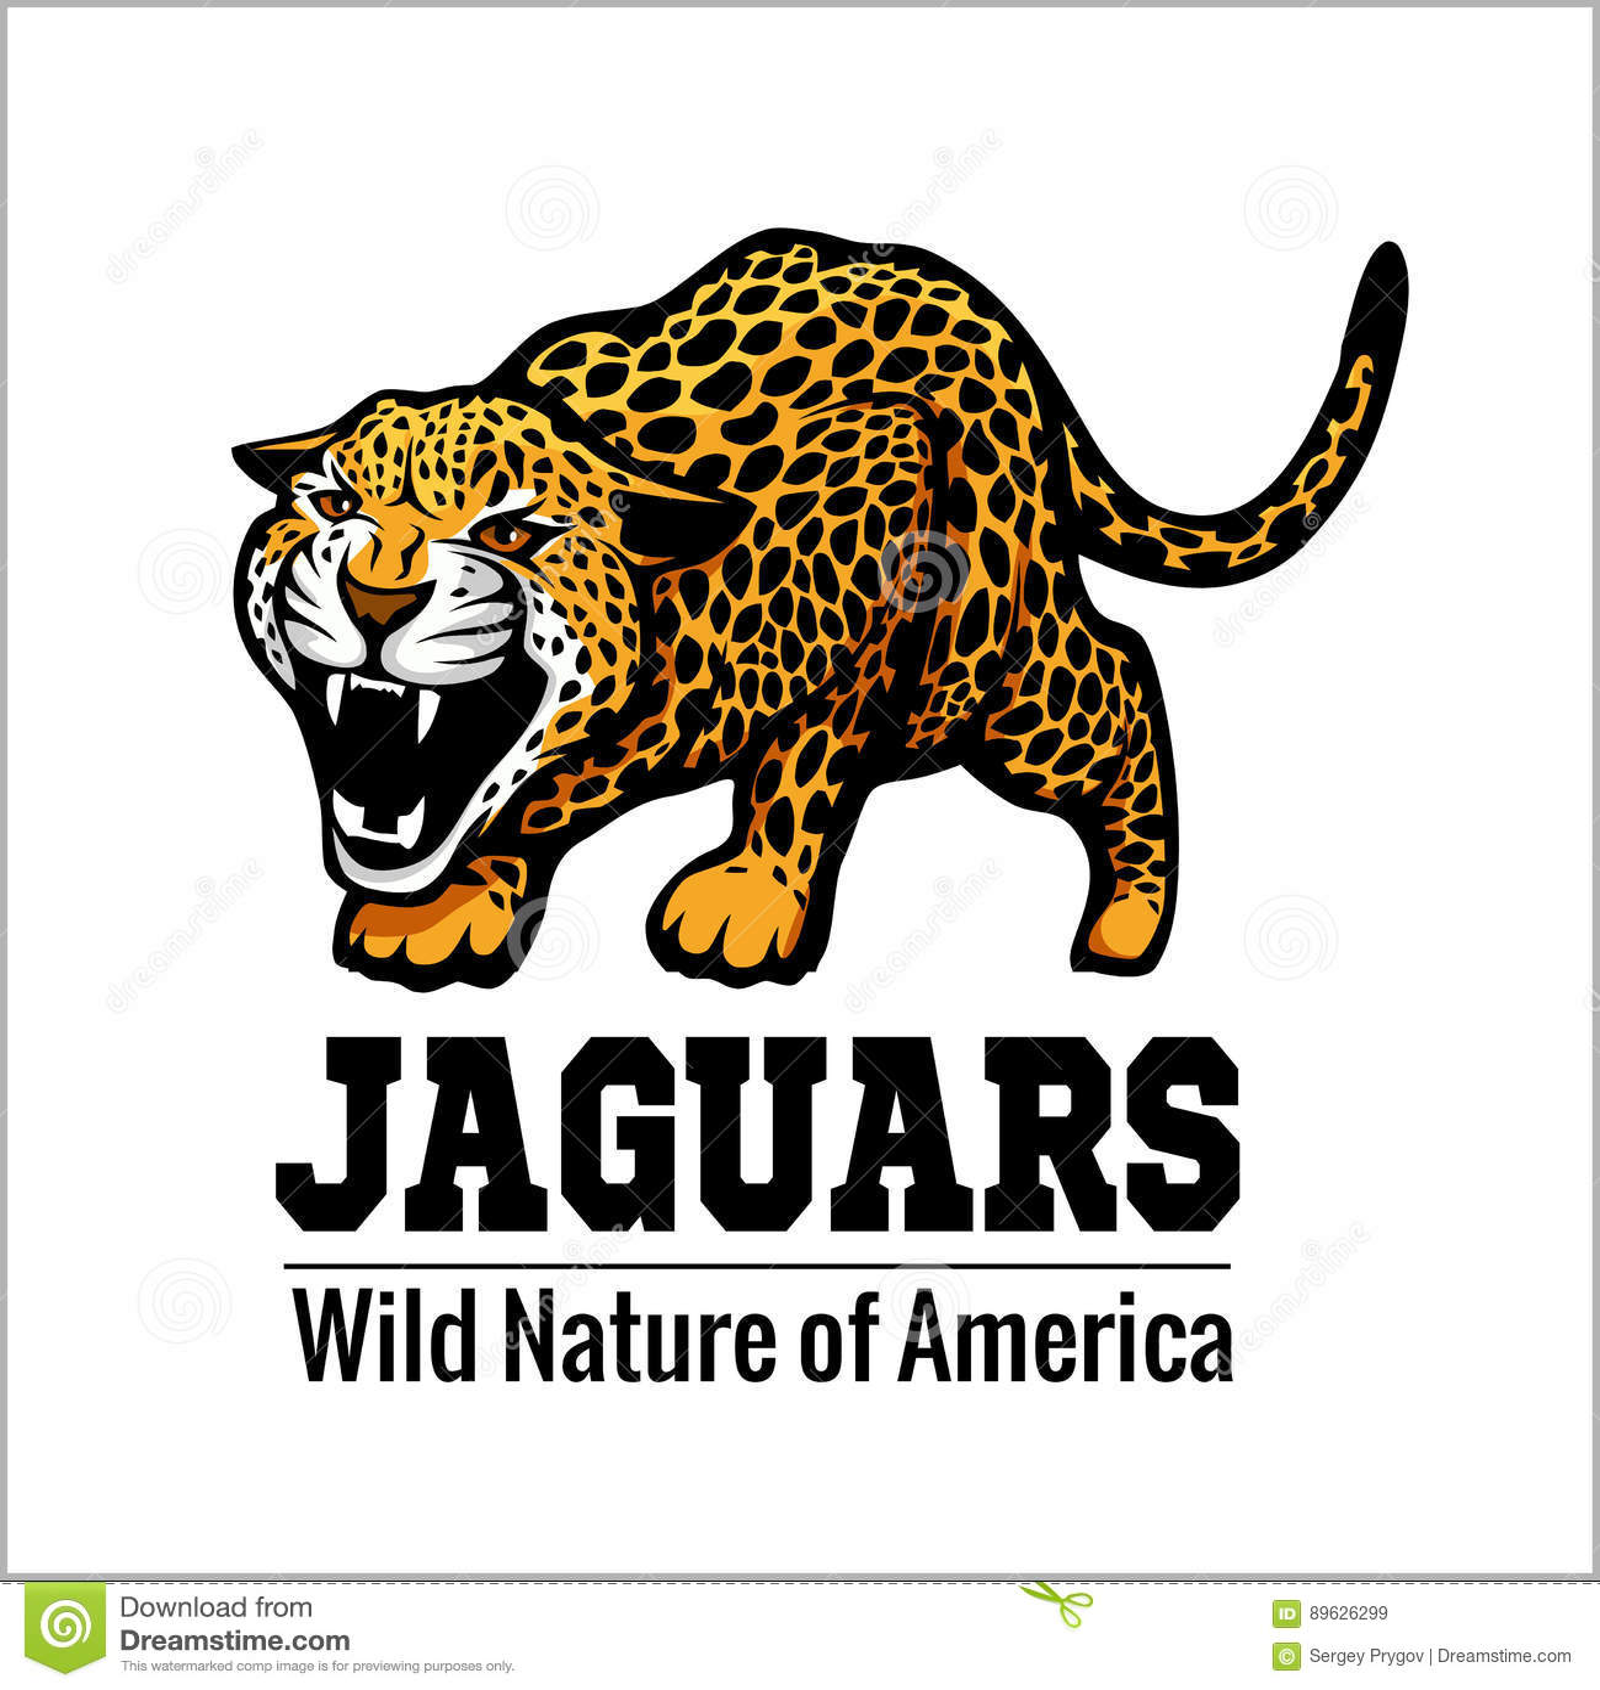 Find Jaguar Dealer: Company Cartoons, Illustrations & Vector Stock Images